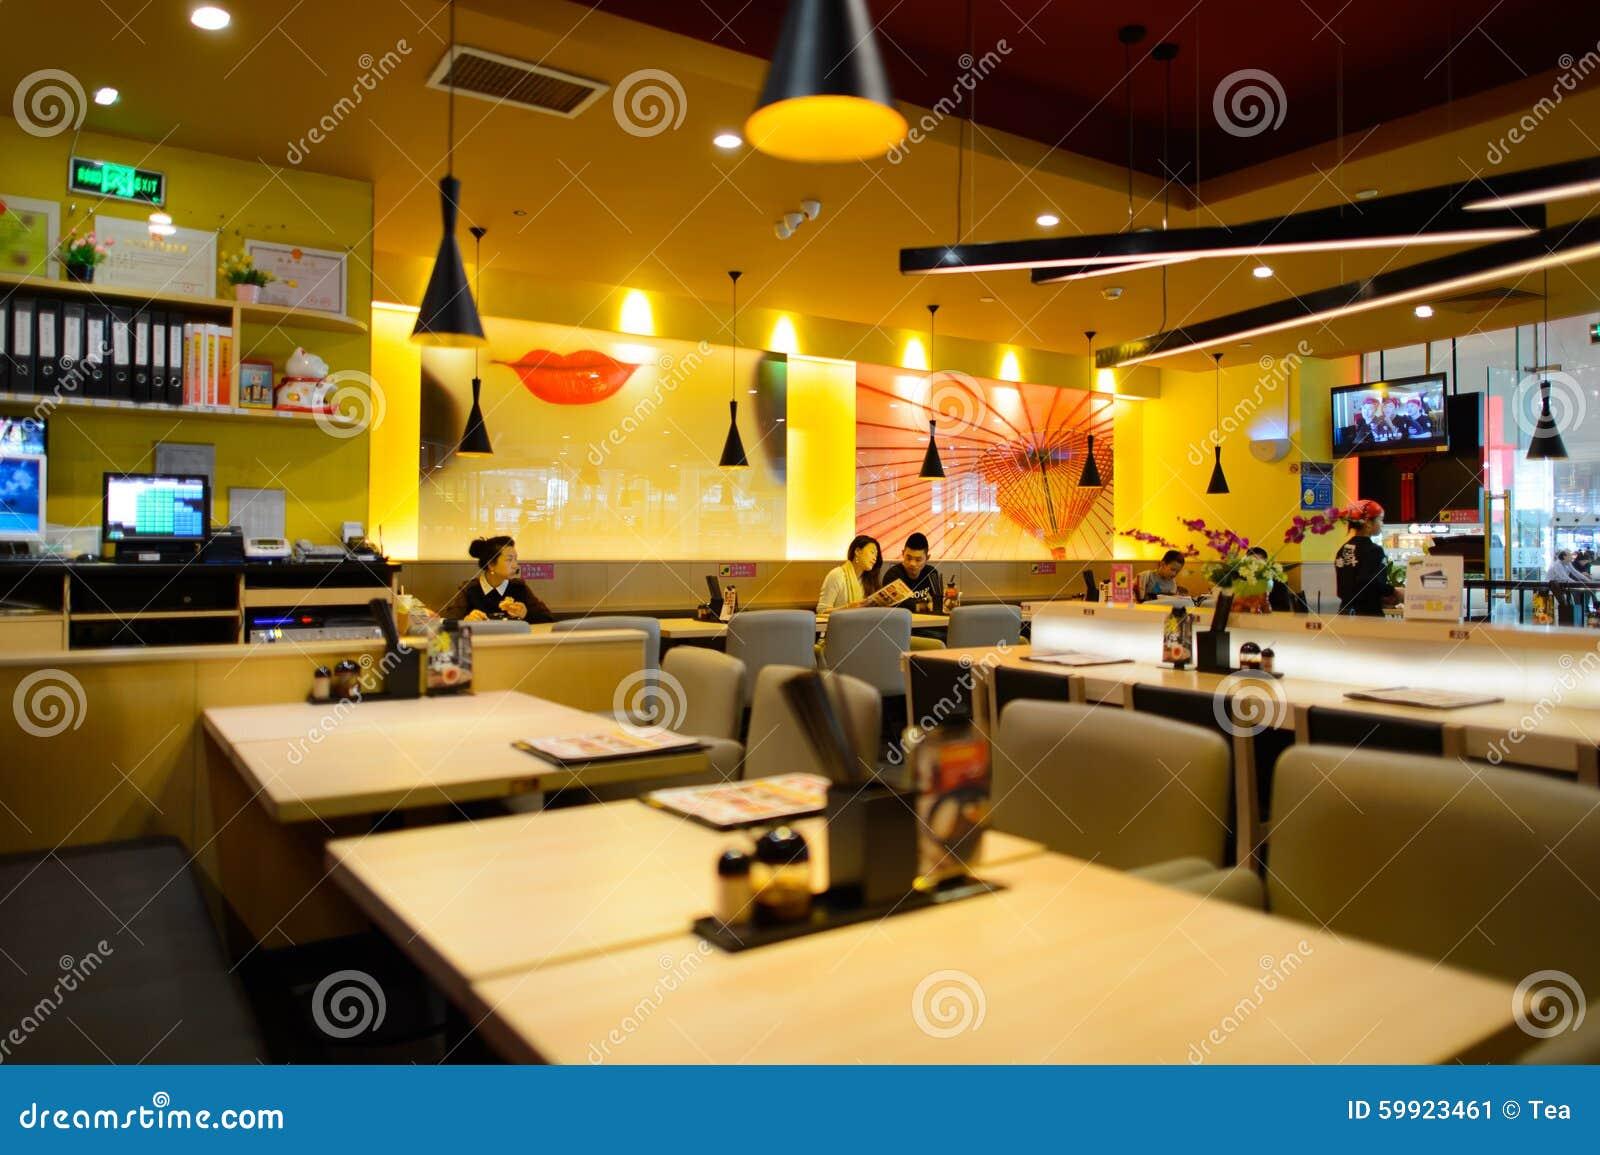 Japanese Fast Food Restaurants In Japan